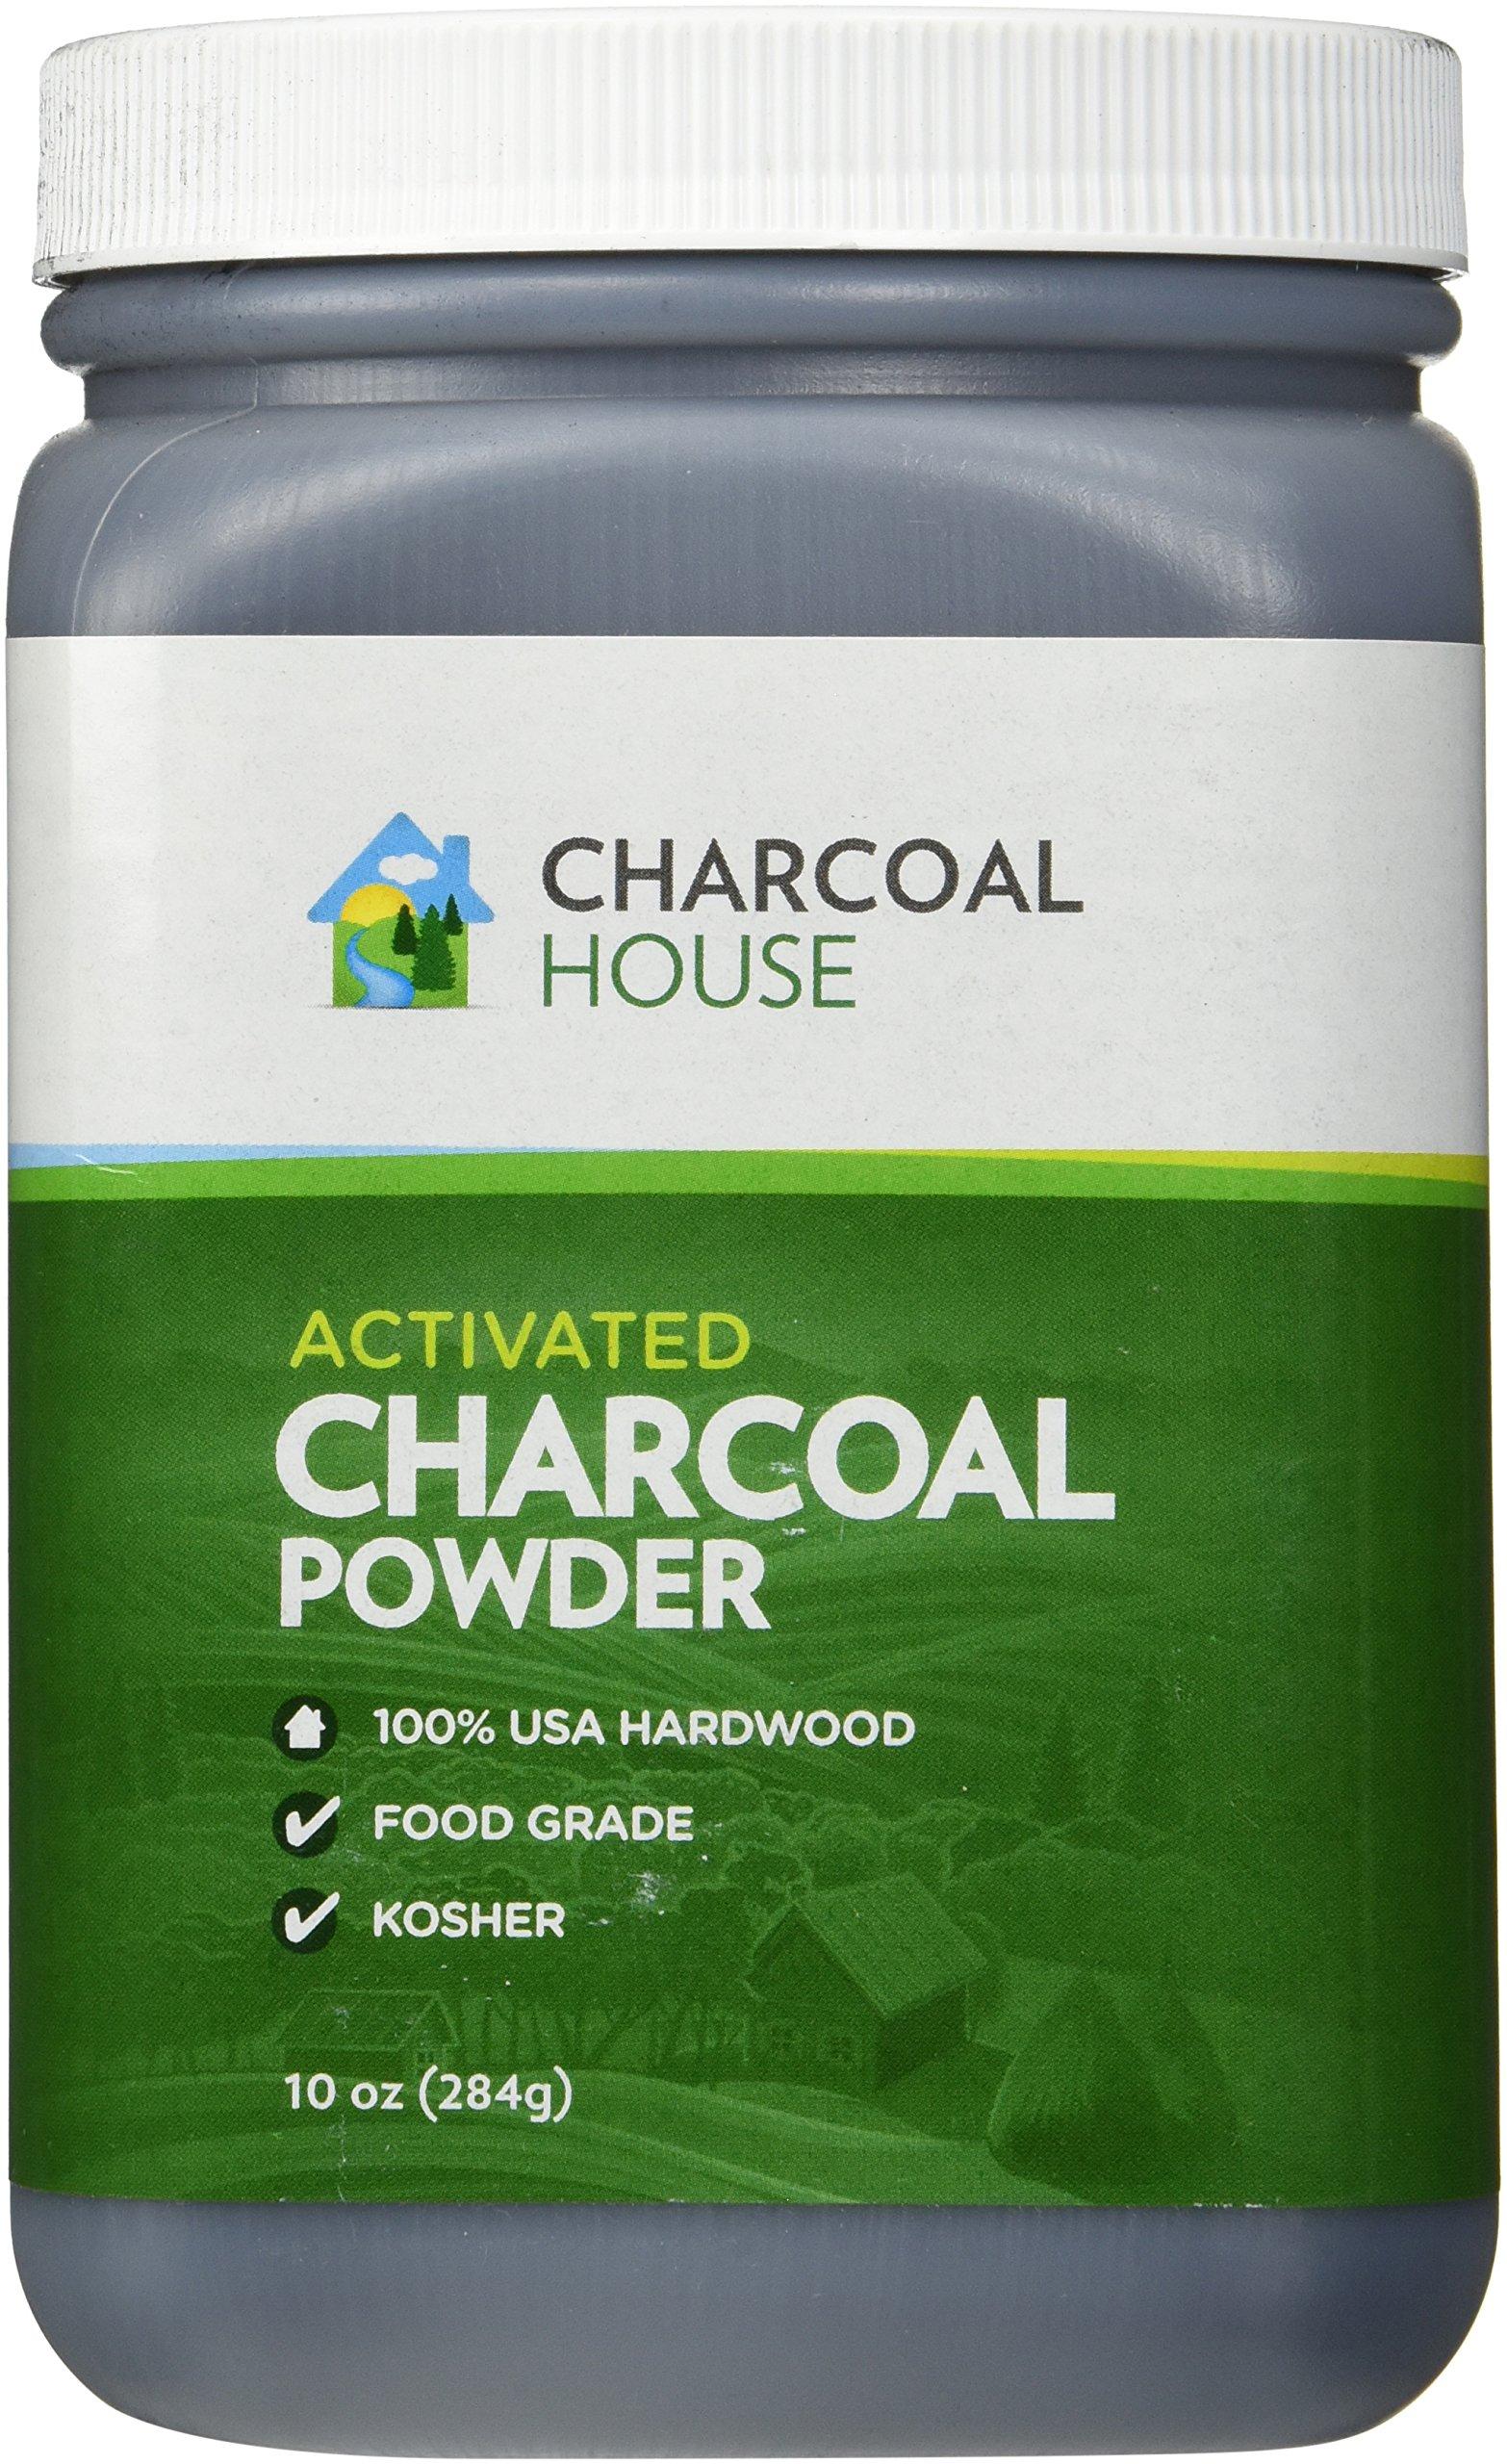 Hardwood Activated Charcoal Powder - Food Grade 10 oz.